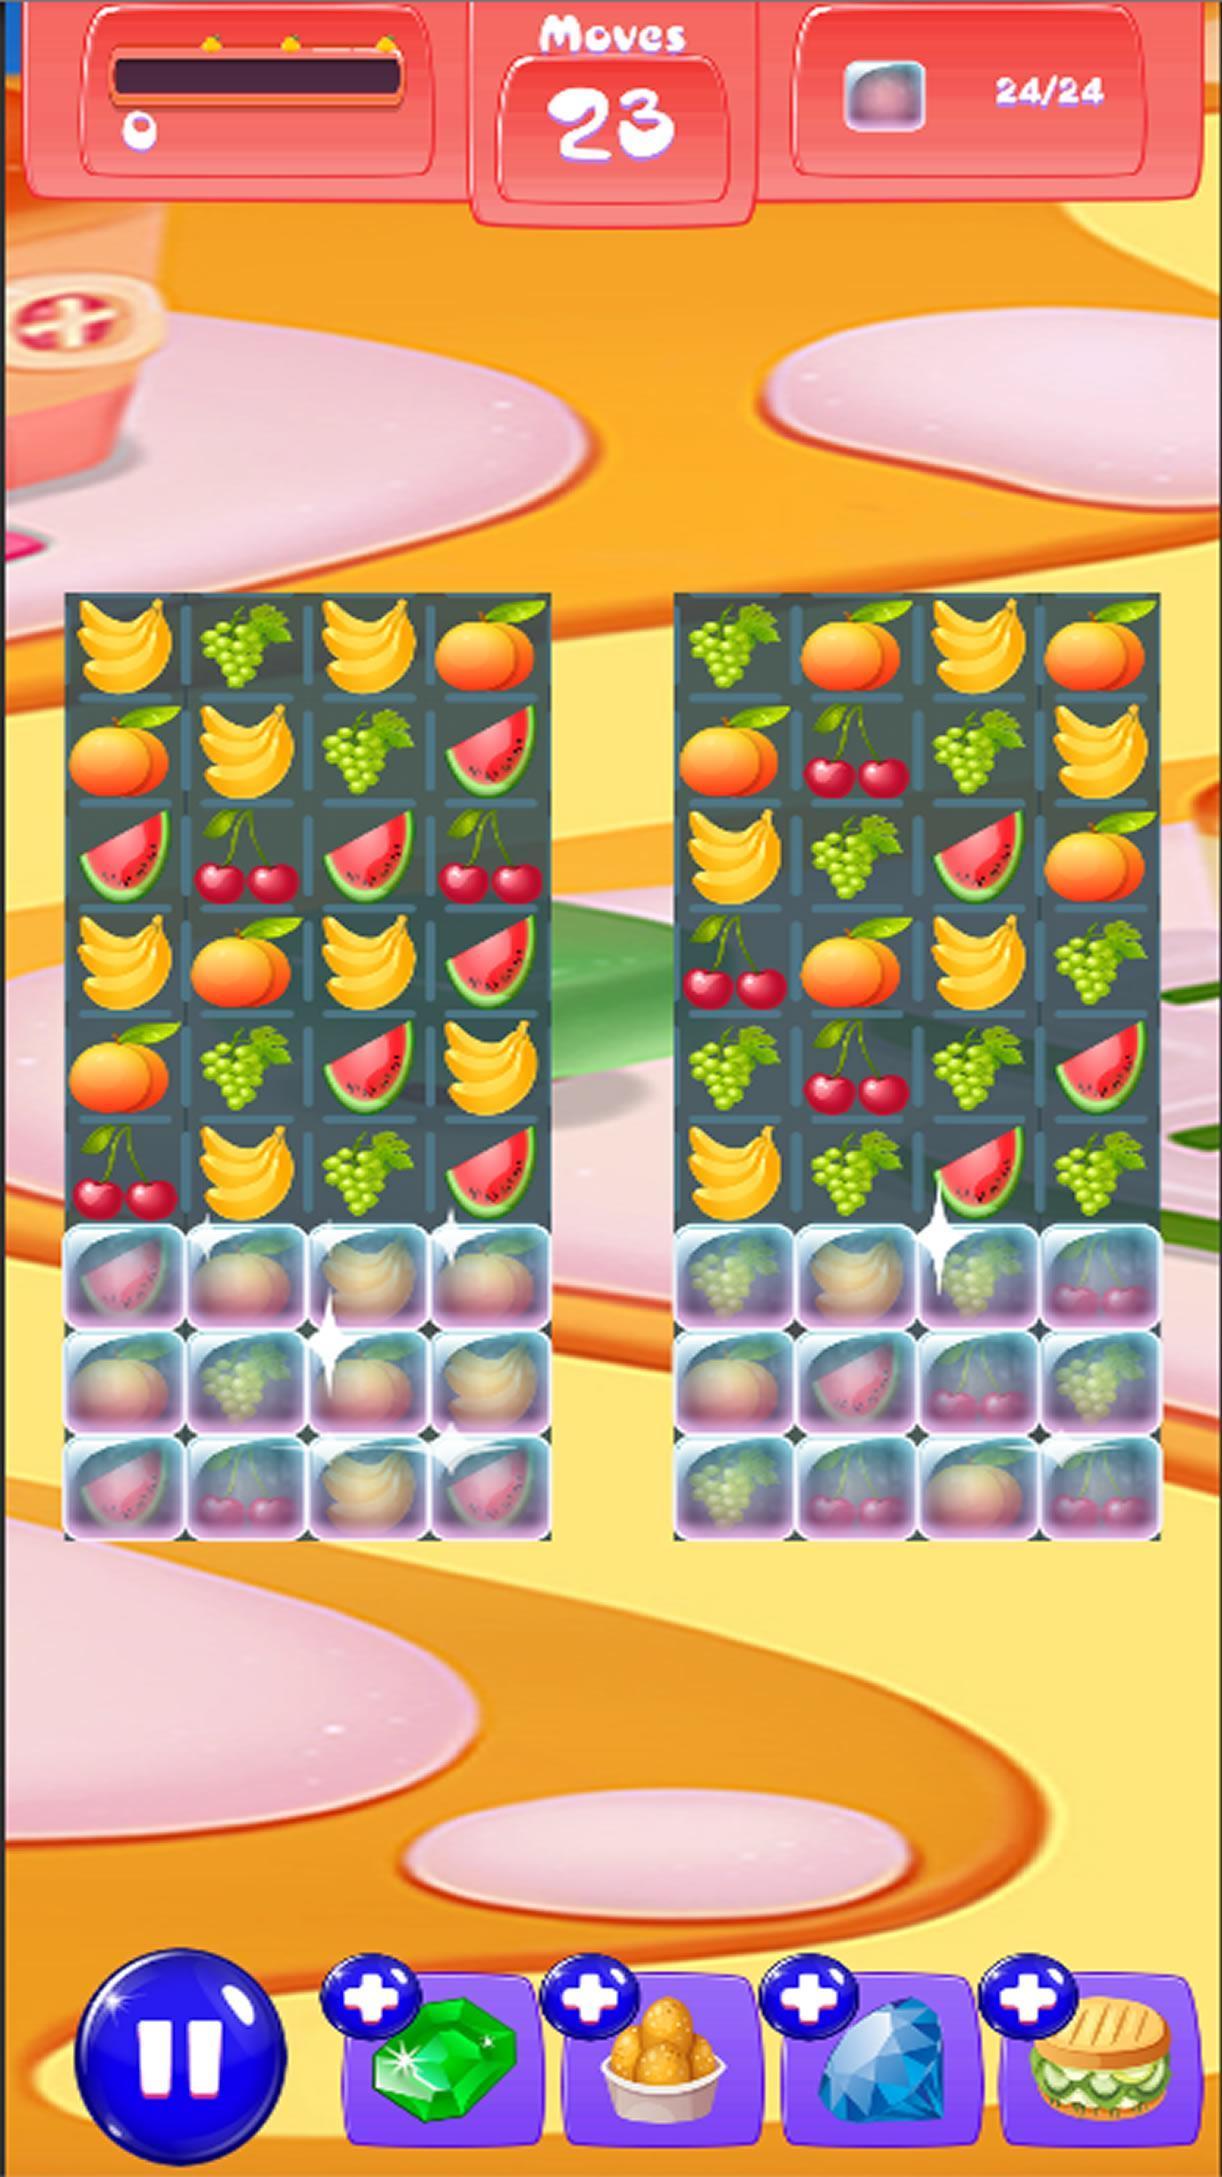 Fruit Splash Match Swipe 1.0 Screenshot 1